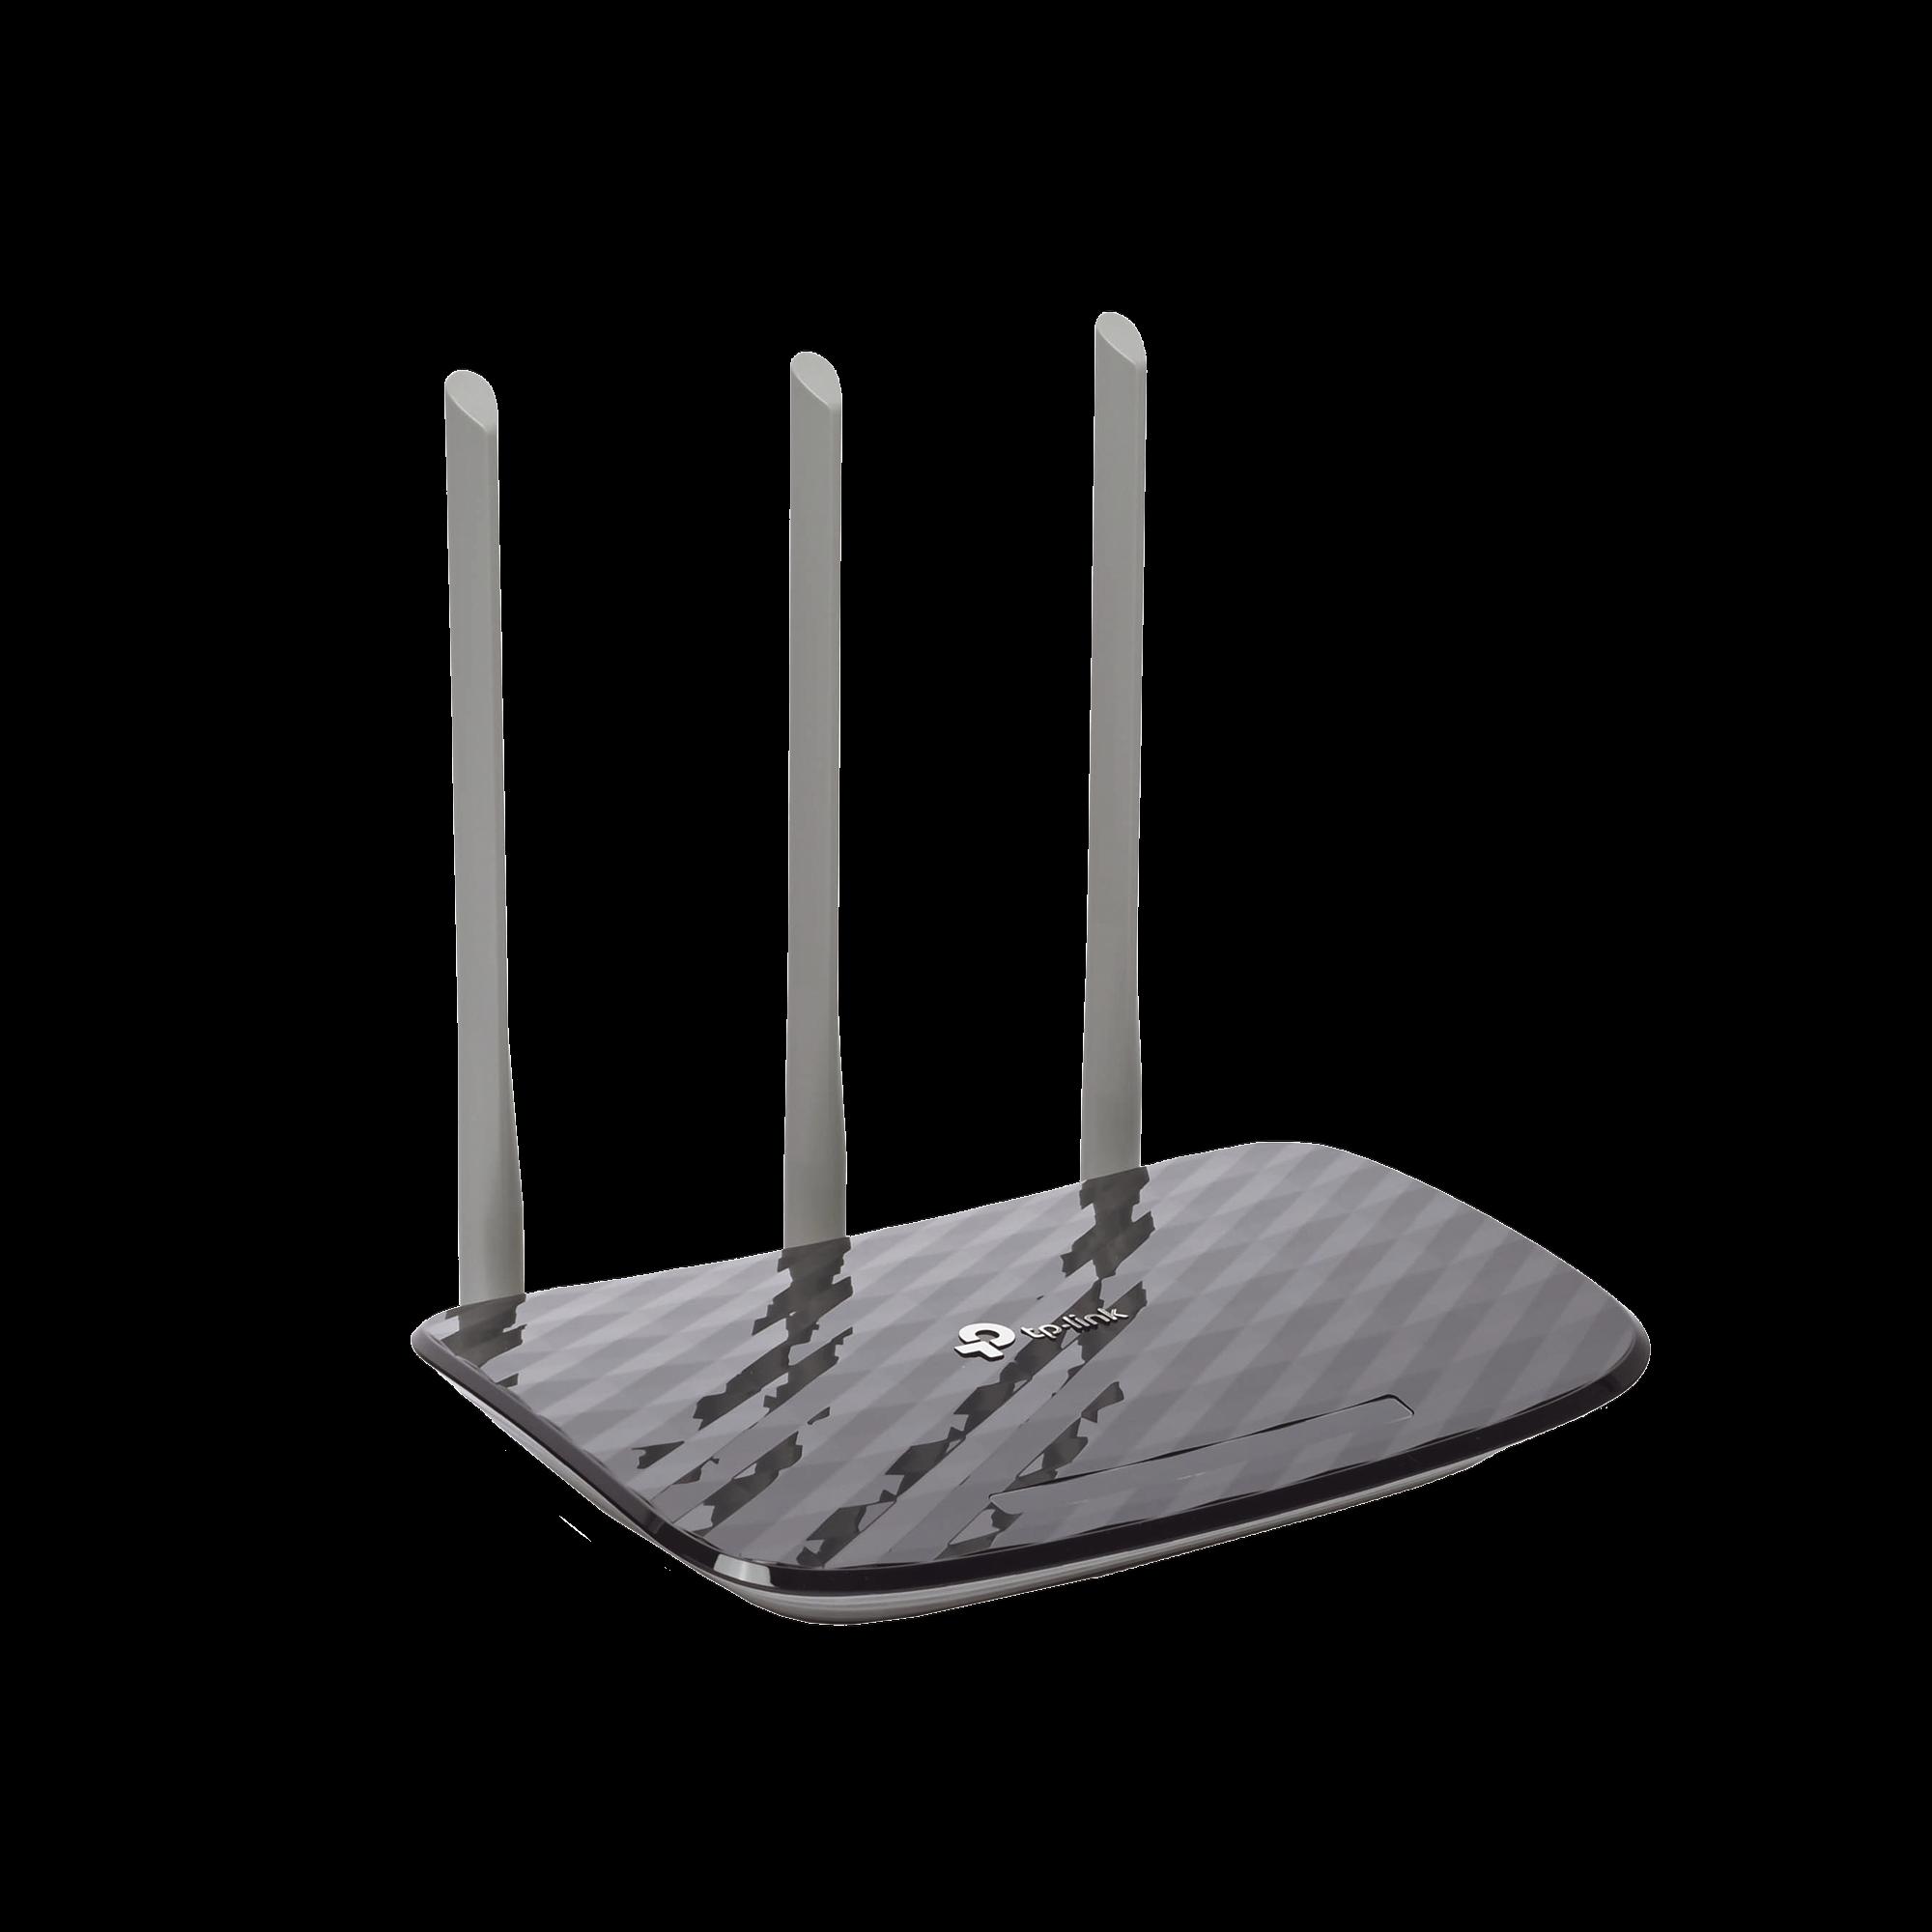 Router Inalámbrico doble banda AC, 2.4 GHz y 5 GHz Hasta 733 Mbps, 3 antenas externas omnidireccional, 4 Puertos LAN 10/100 Mbps, 1 Puerto WAN 10/100 Mbps